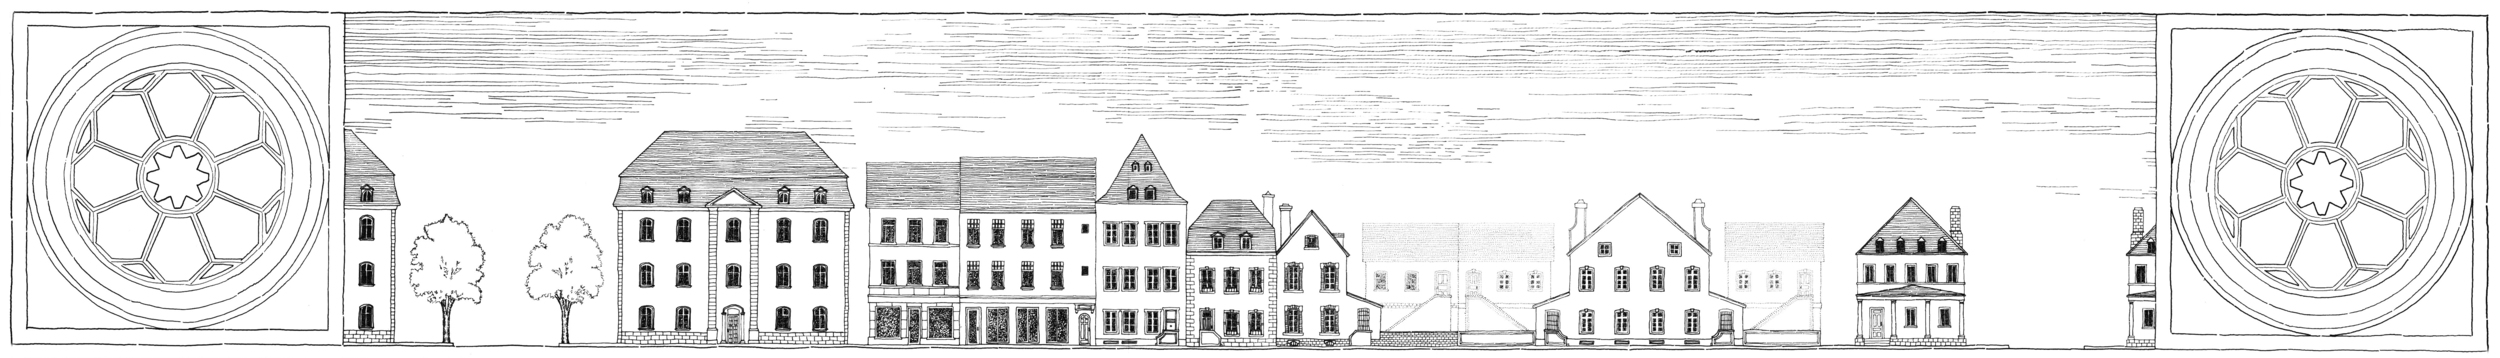 Neue Stadt_Building Types.jpg